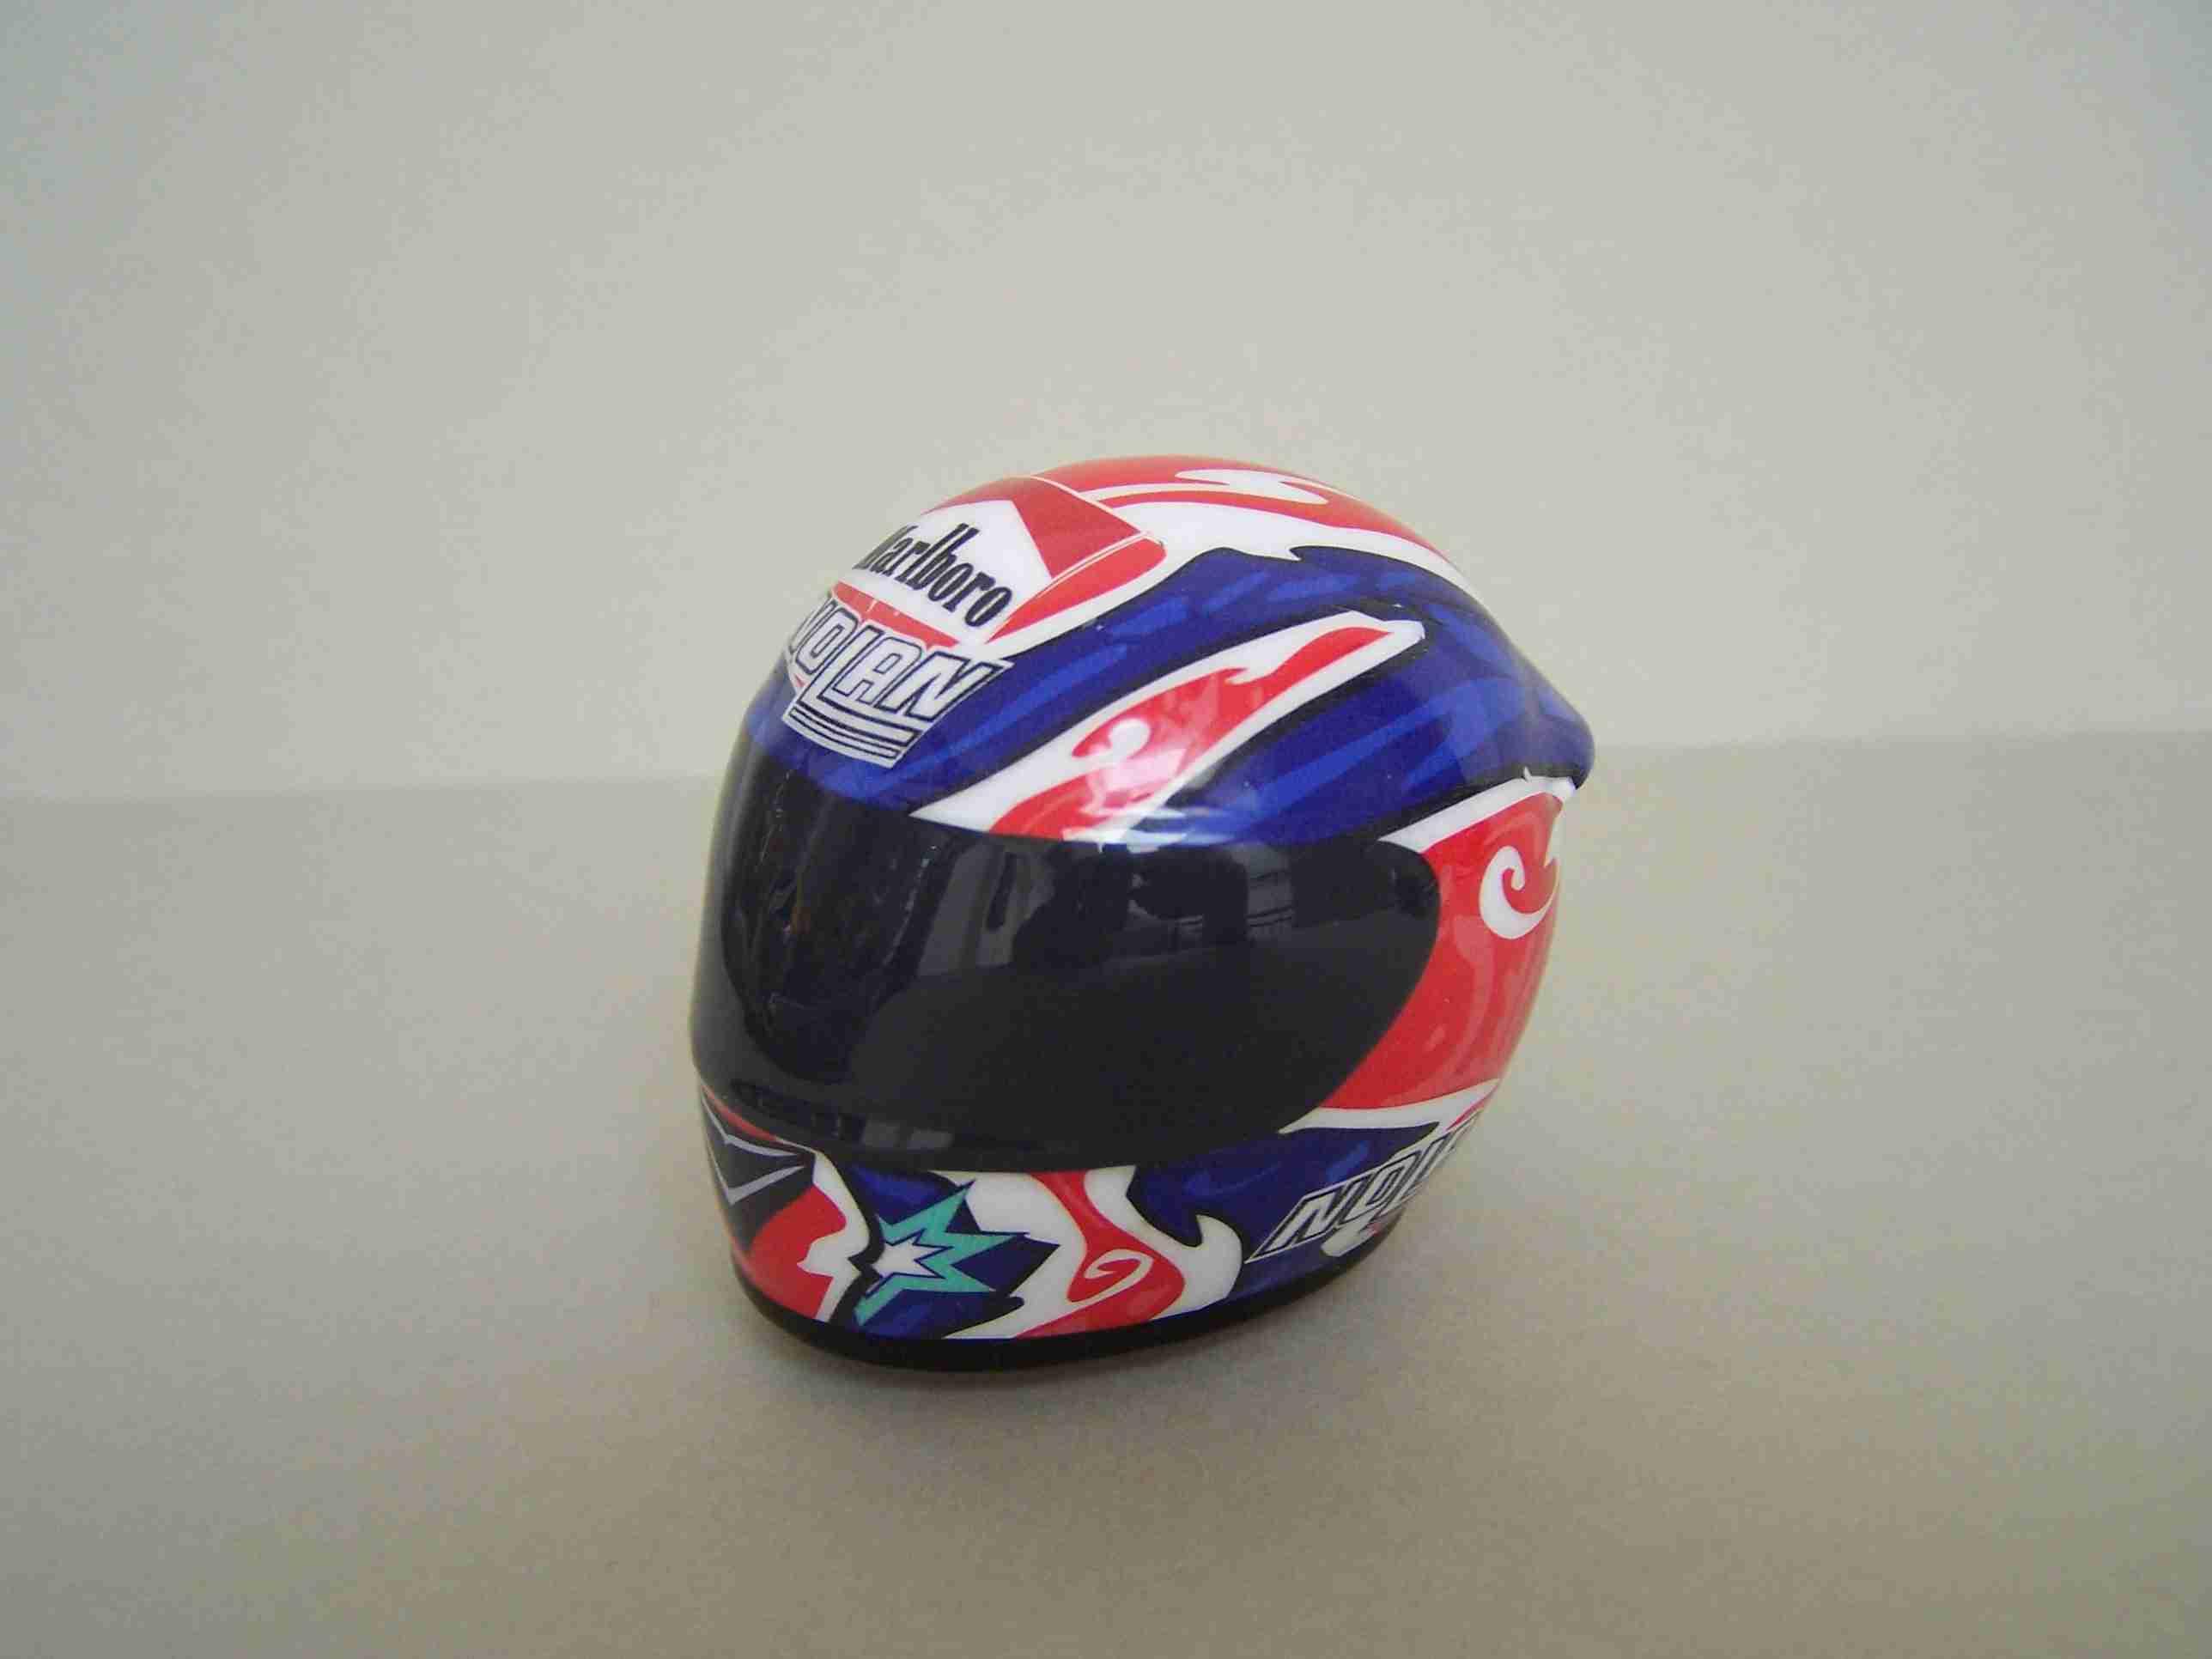 [Helm-Factory-Bike-Body-Ducati-2007-Driver-Stoner.jpg]